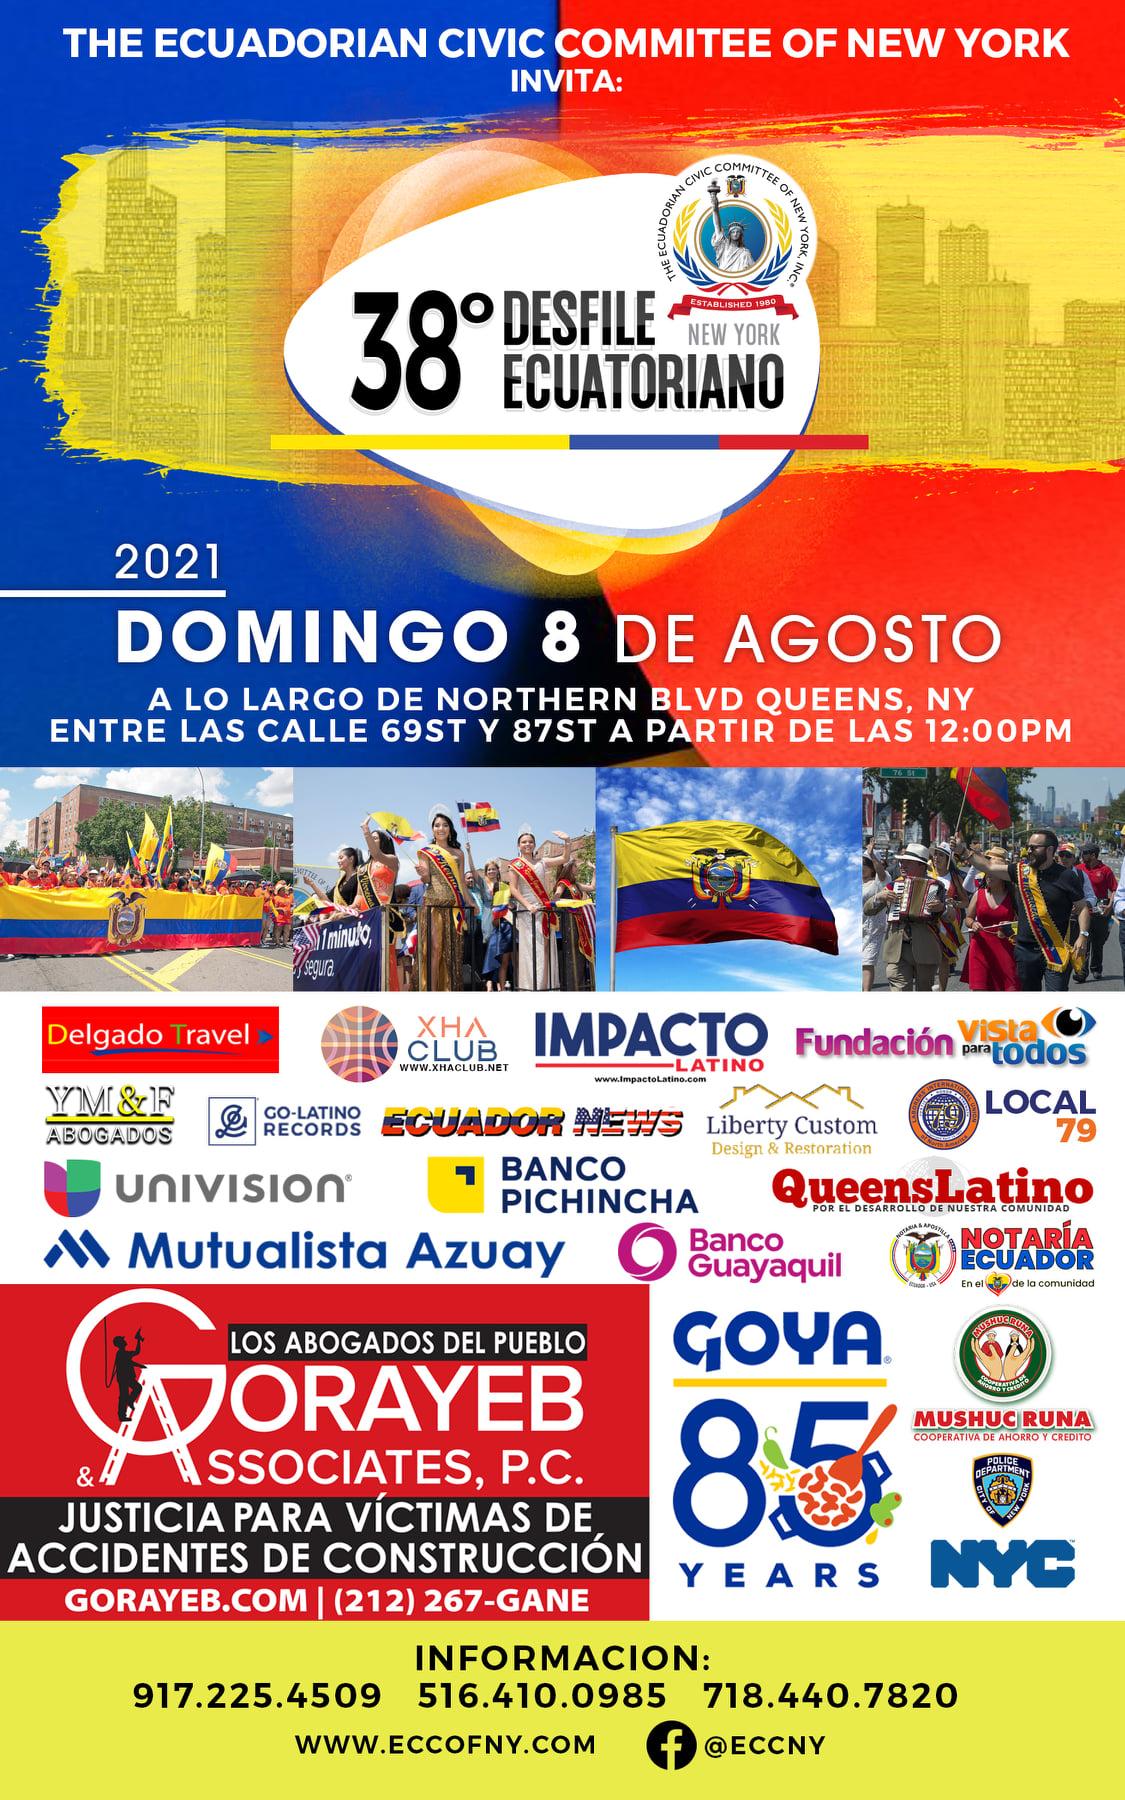 Desfile Ecuatoriano